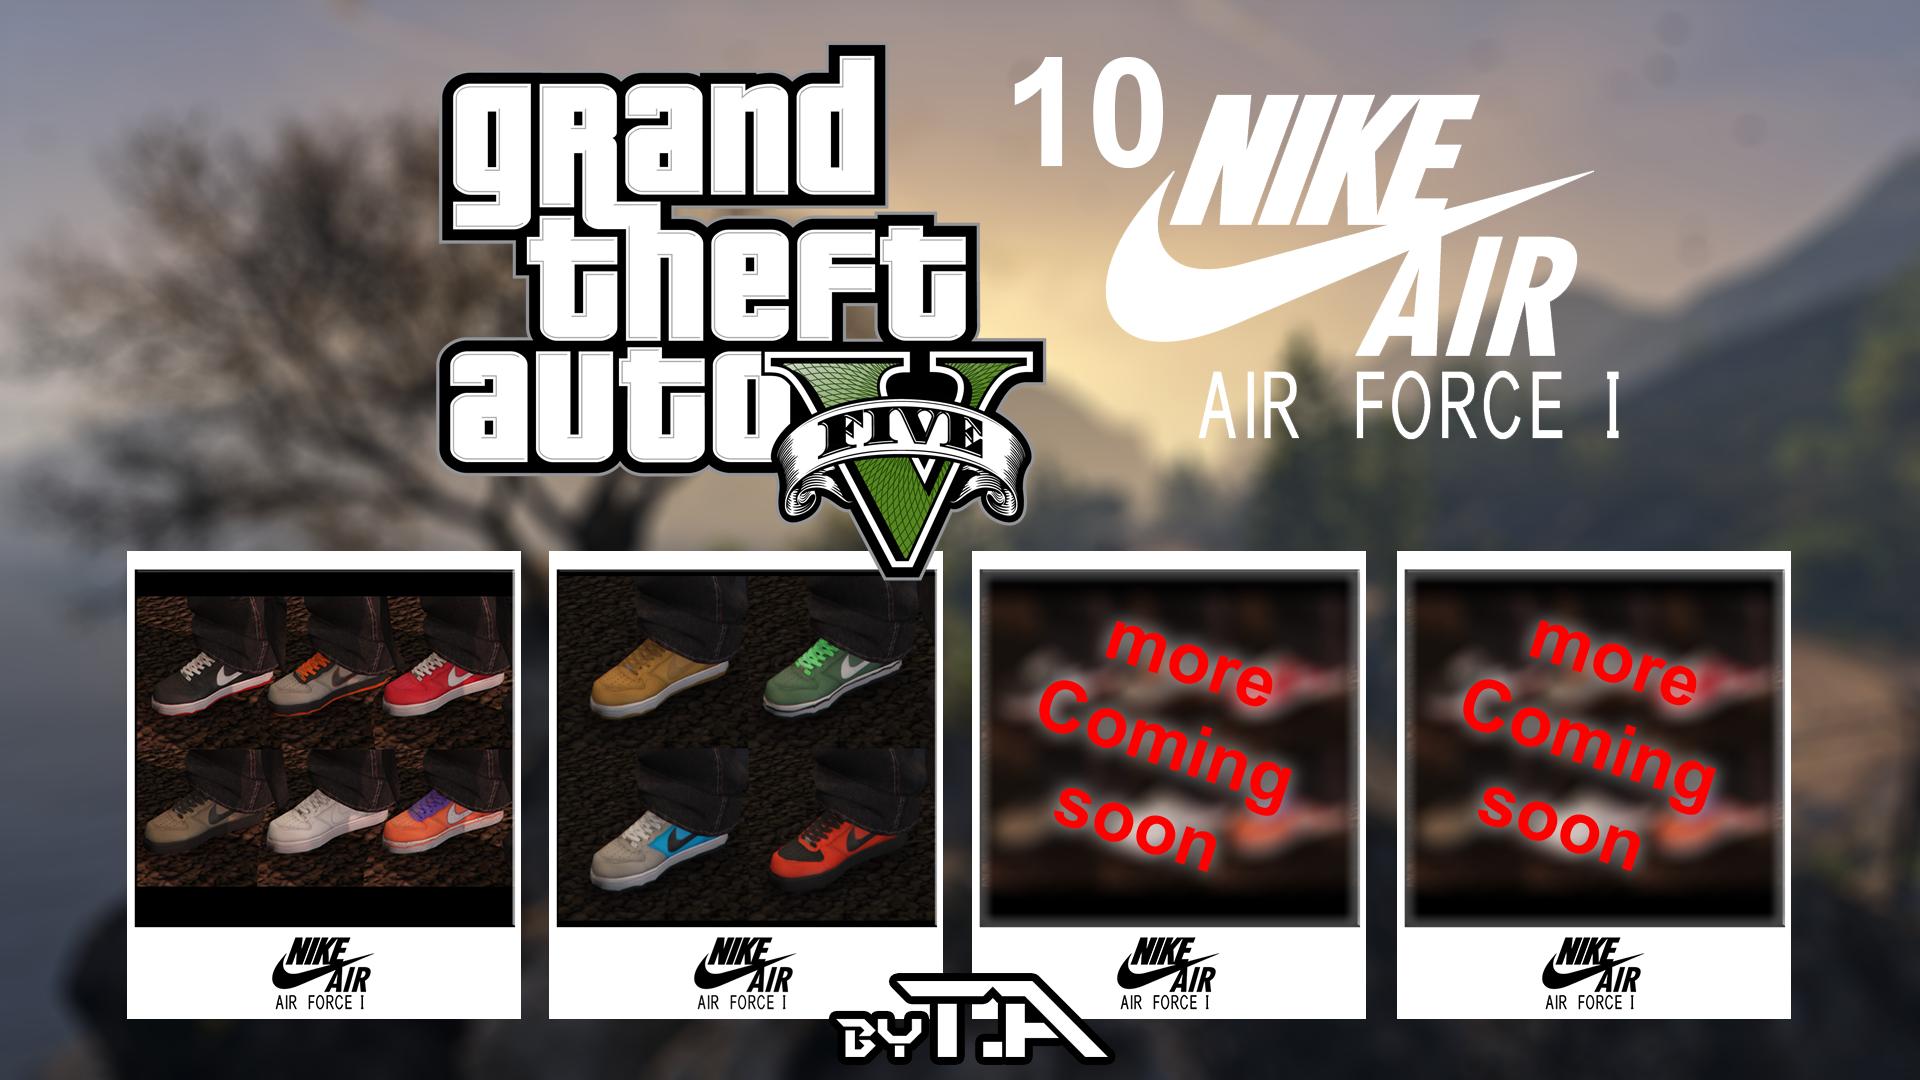 Nike air force one pack gta5 for Gta v bedroom wallpaper